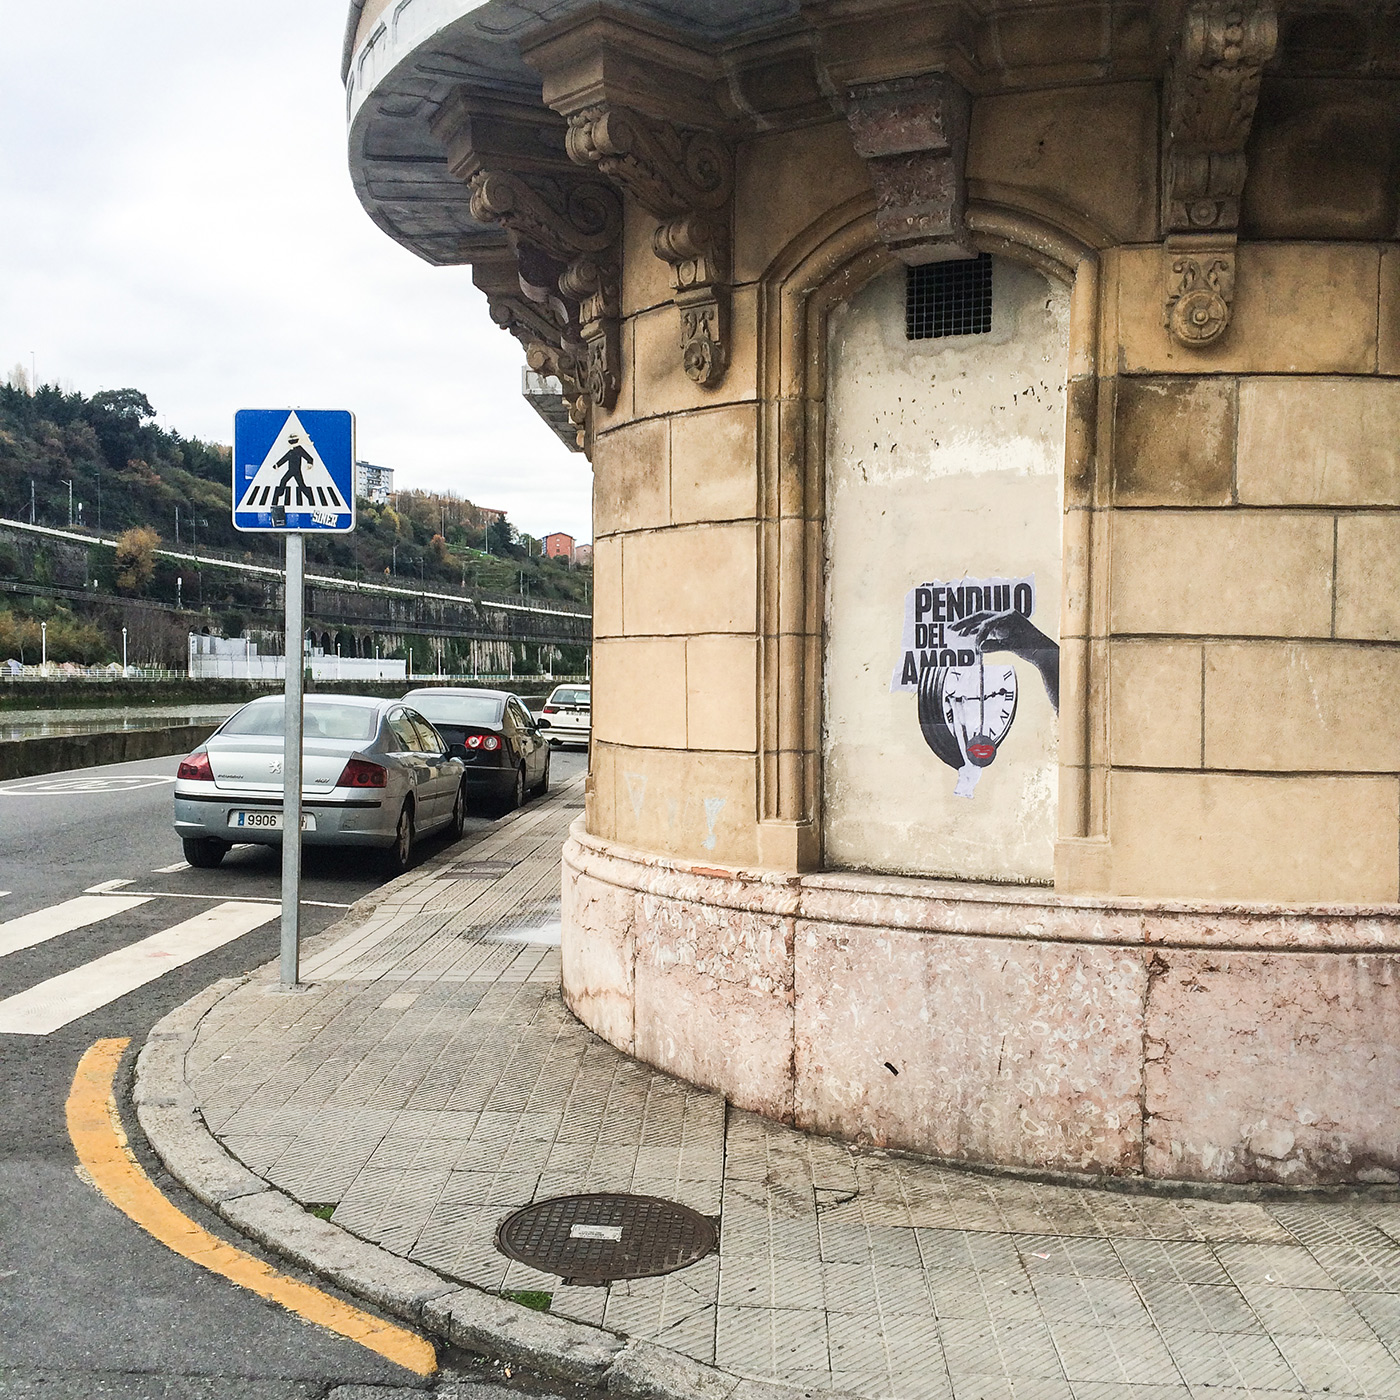 Mateo-Bilbao-Urban-collage-5.jpg